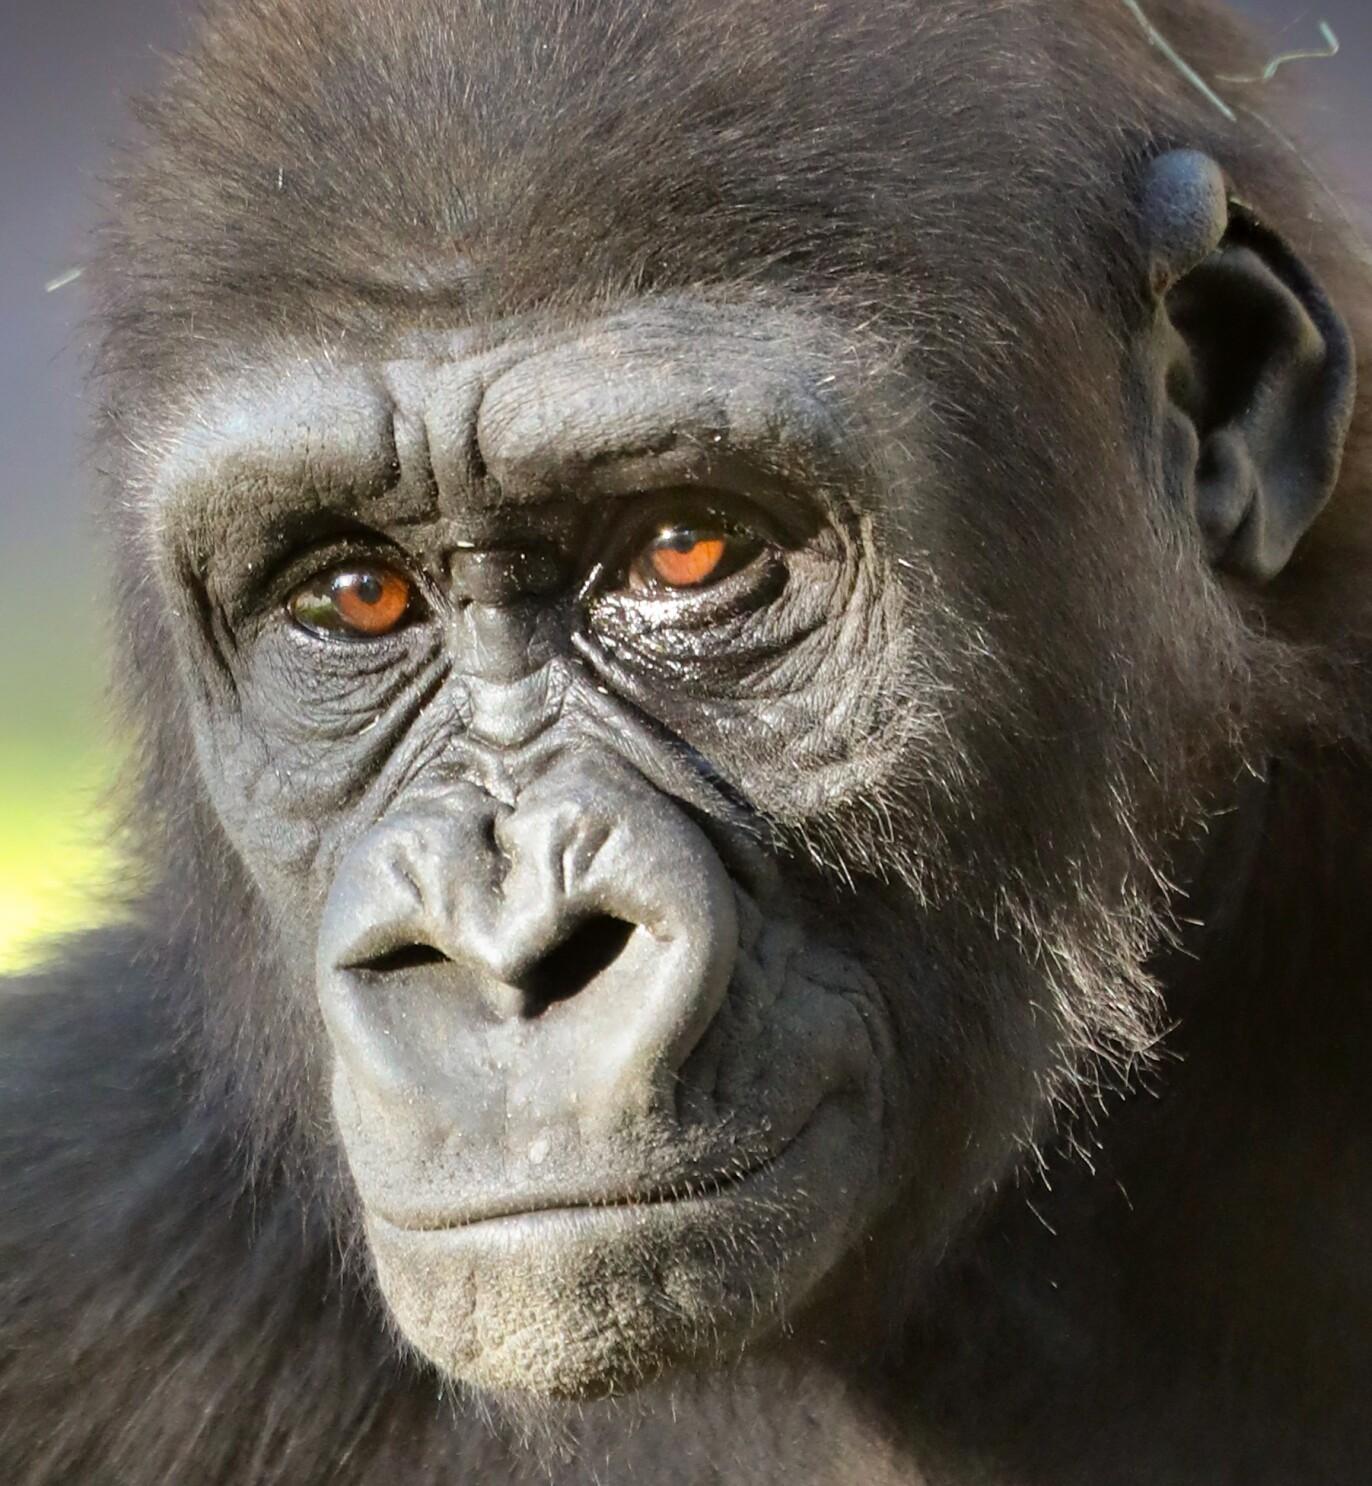 Leslie, a Safari Park gorilla, undergoes cataract surgery